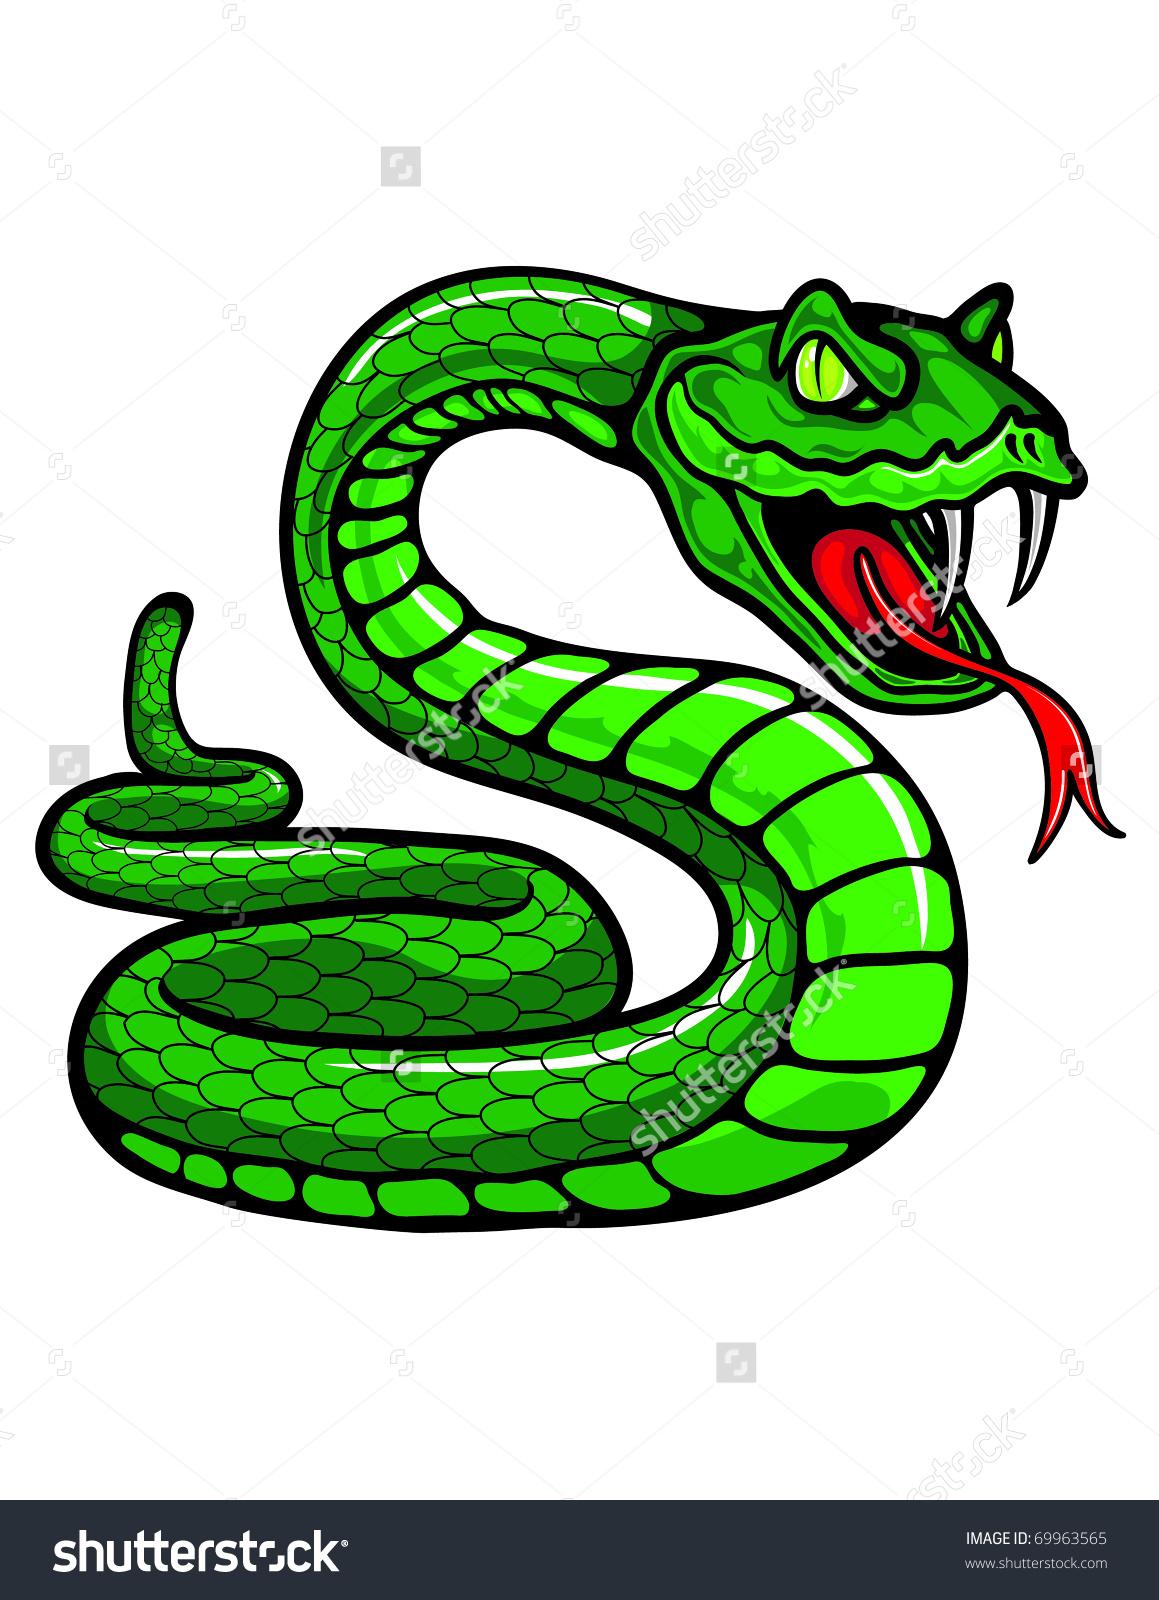 Snake tongue clipart.